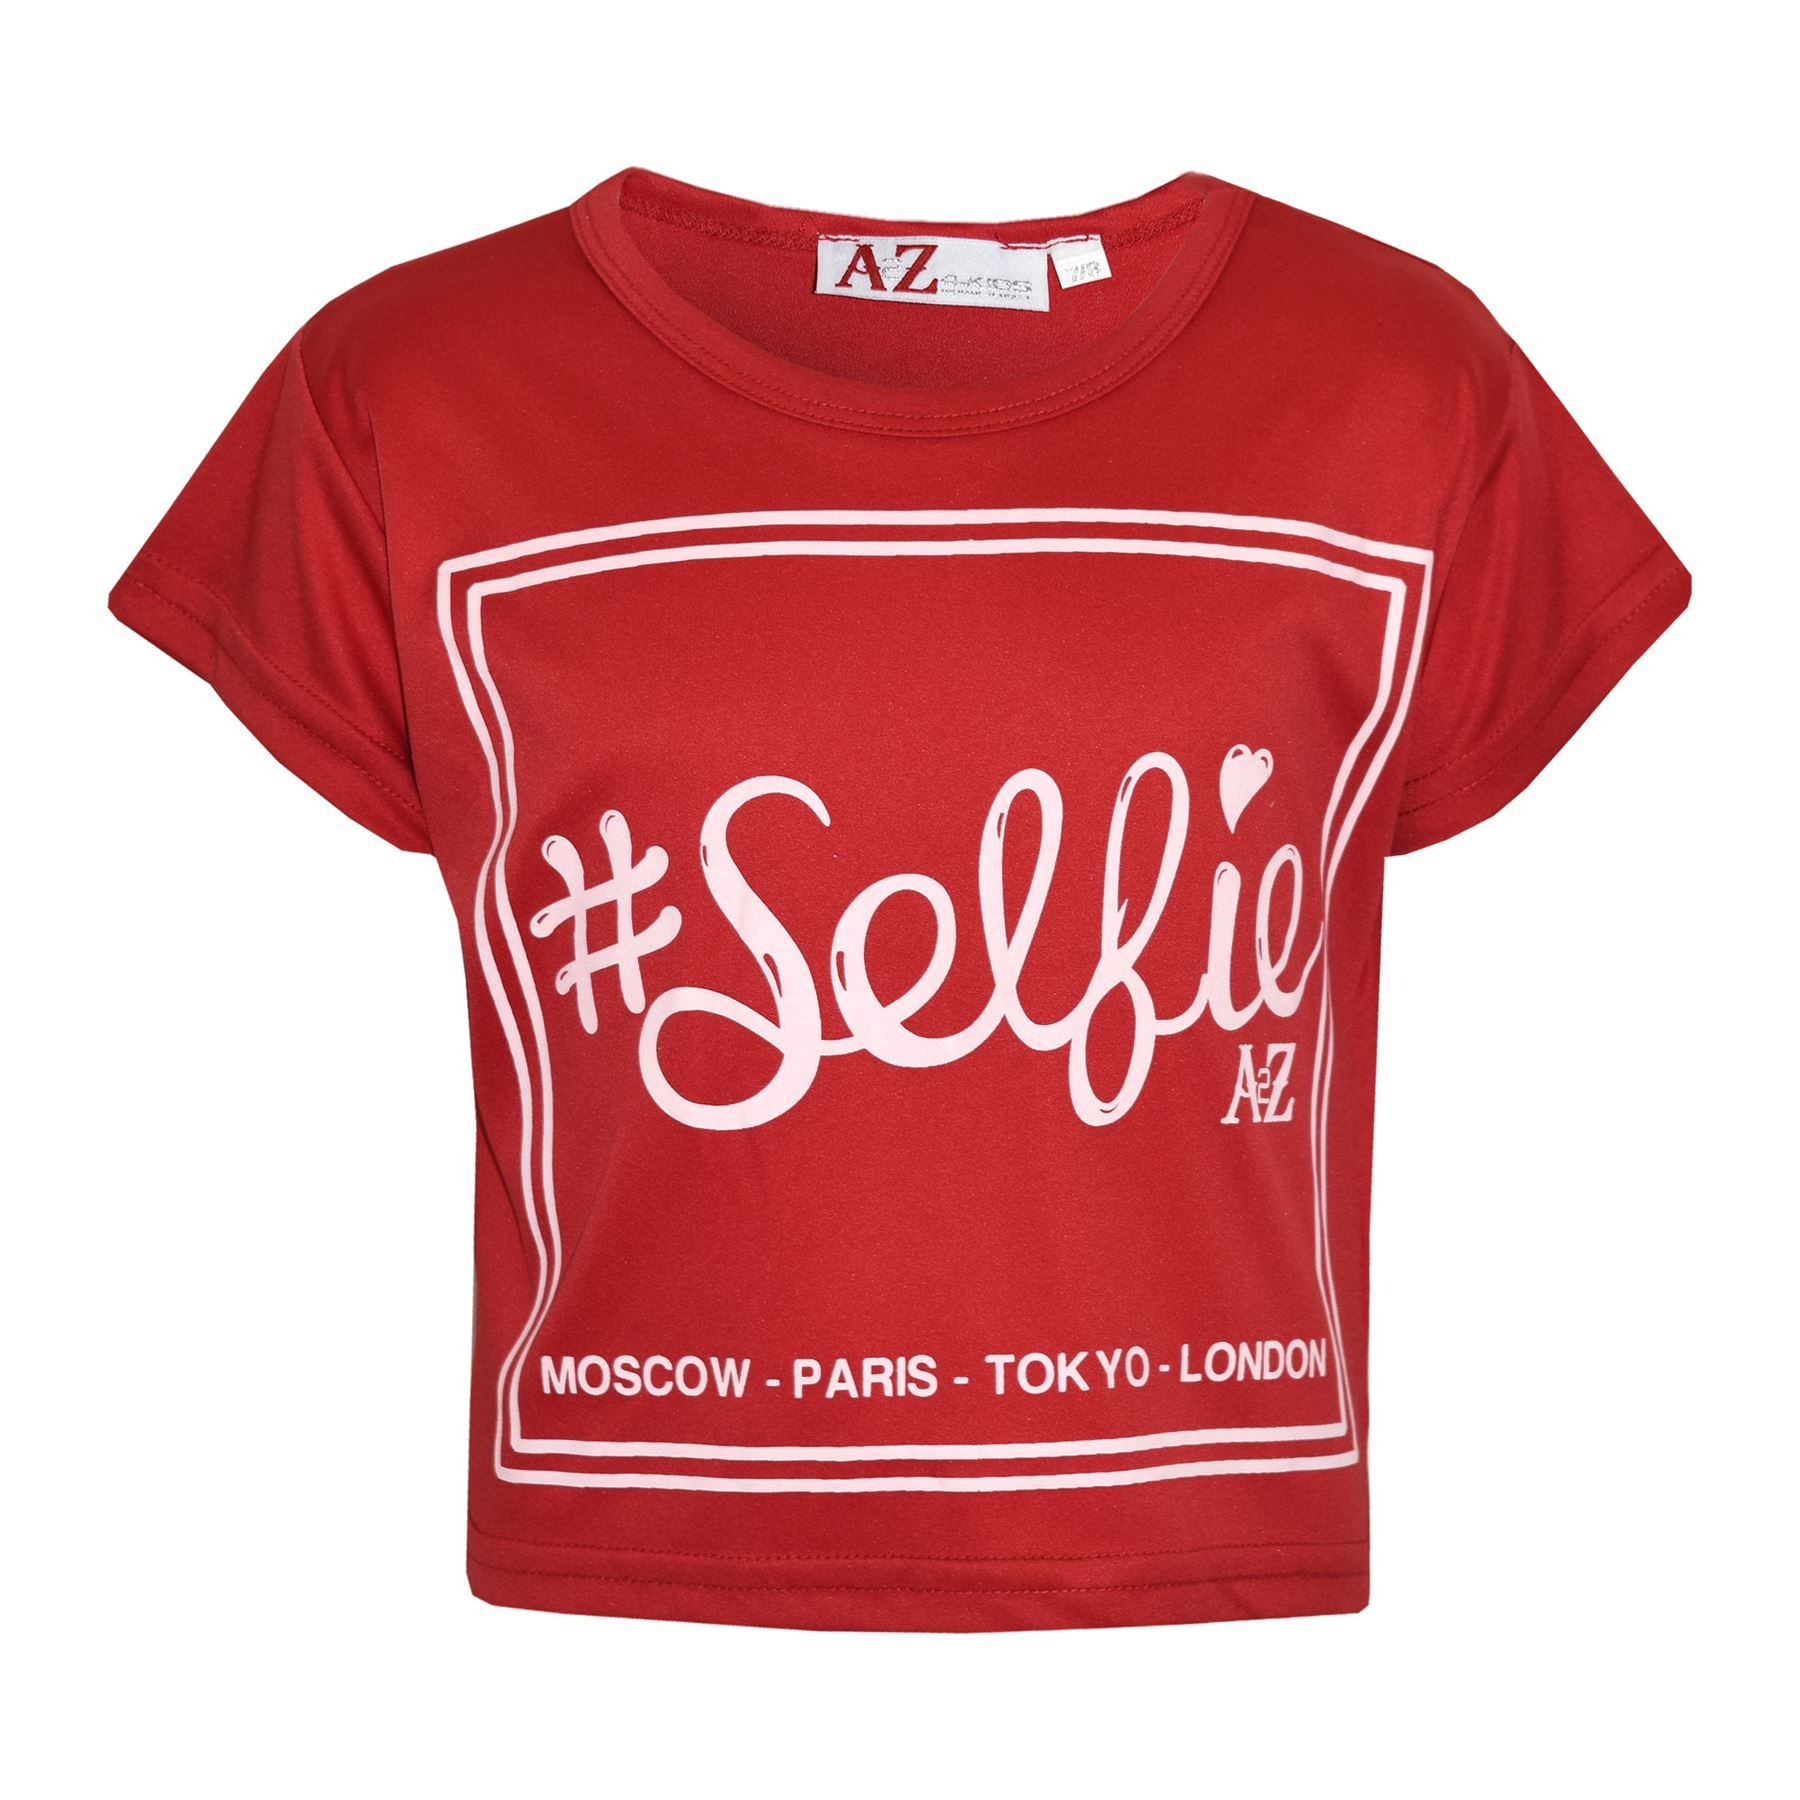 Kids Girls Top #Selfie Print Stylish Crop Top /& Skater Skirt Sets Age 5-13 Years